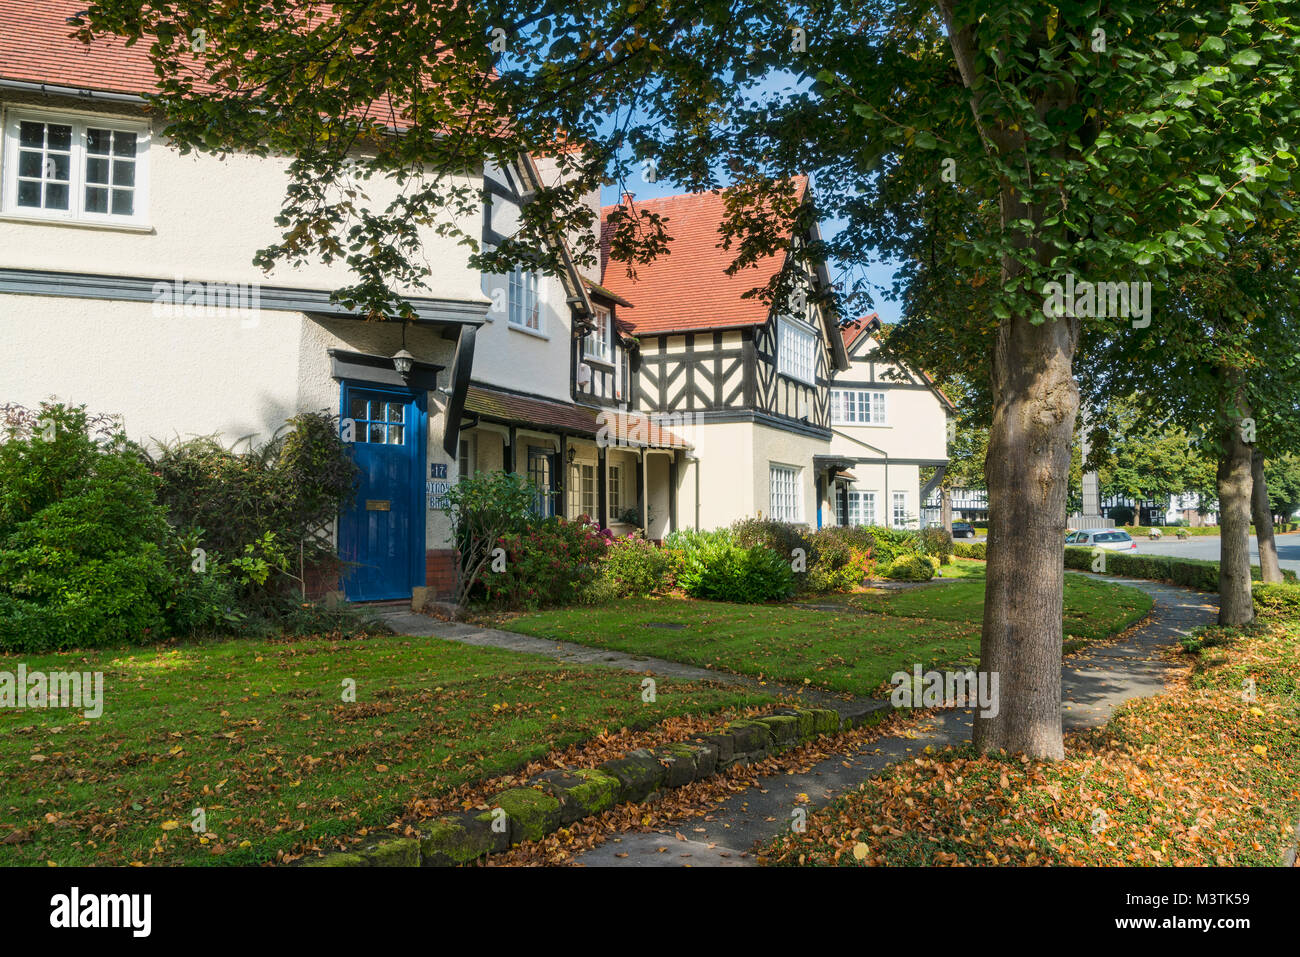 Workers houses, Port Sunlight, Bebington, Wirral, Merseyside, UK - Stock Image